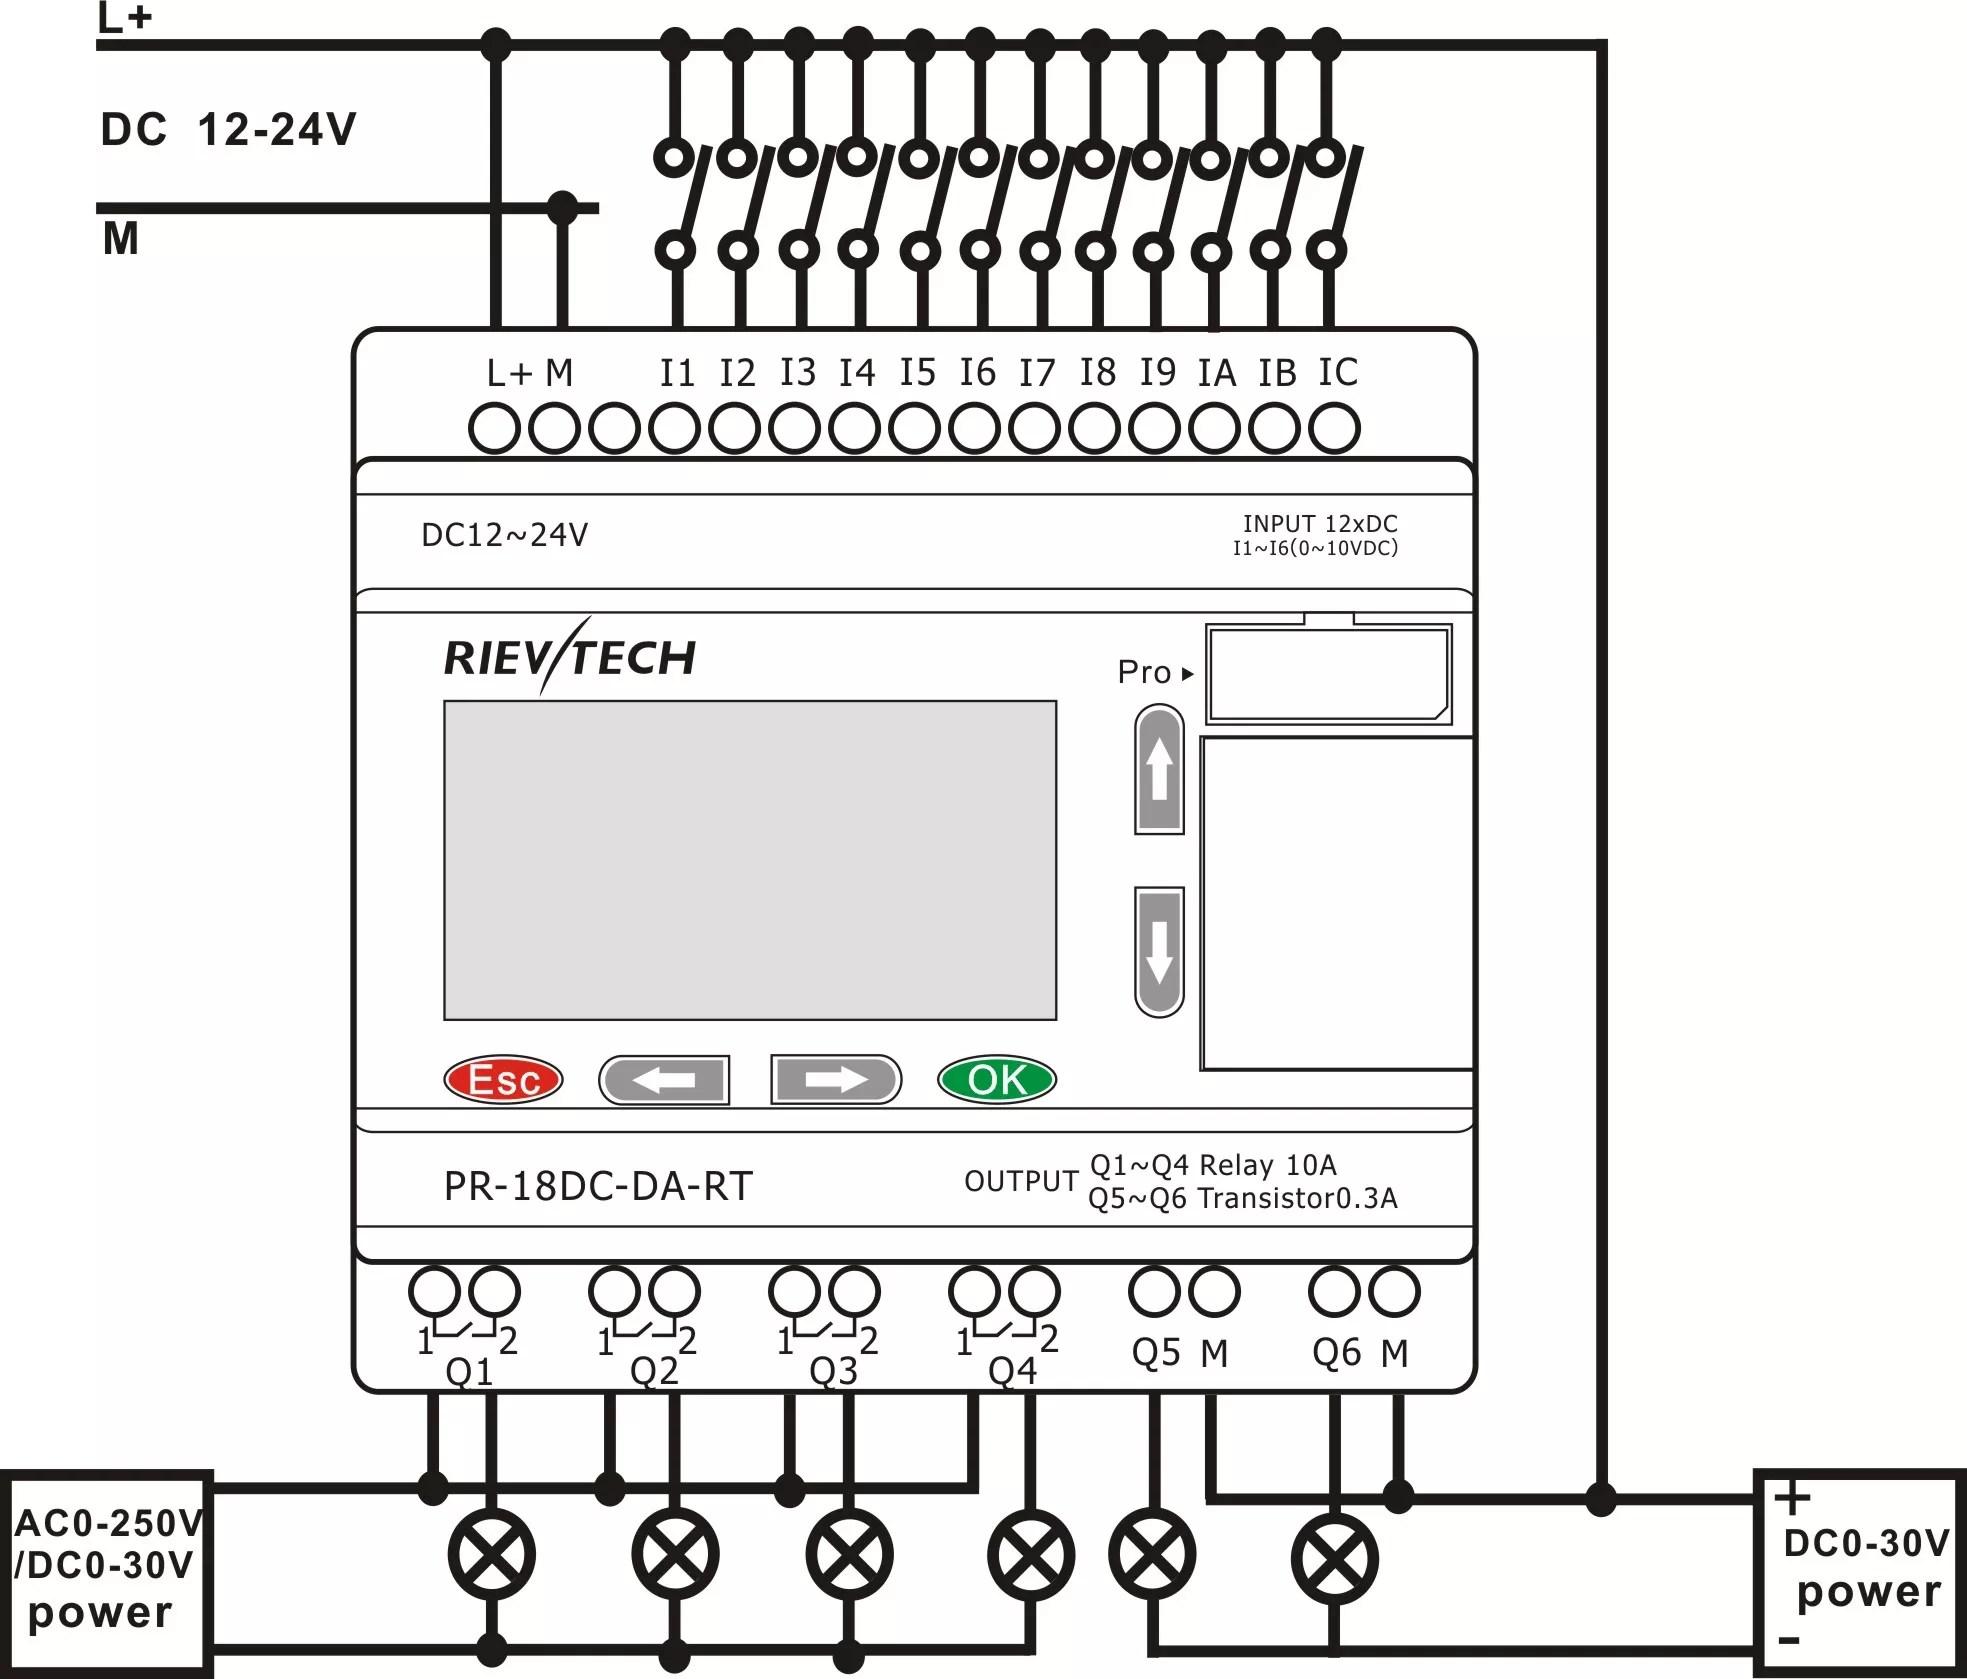 hight resolution of logo wiring diagram database wiring diagramwiring diagram logo wiring diagram img logo wiring diagram logo wiring